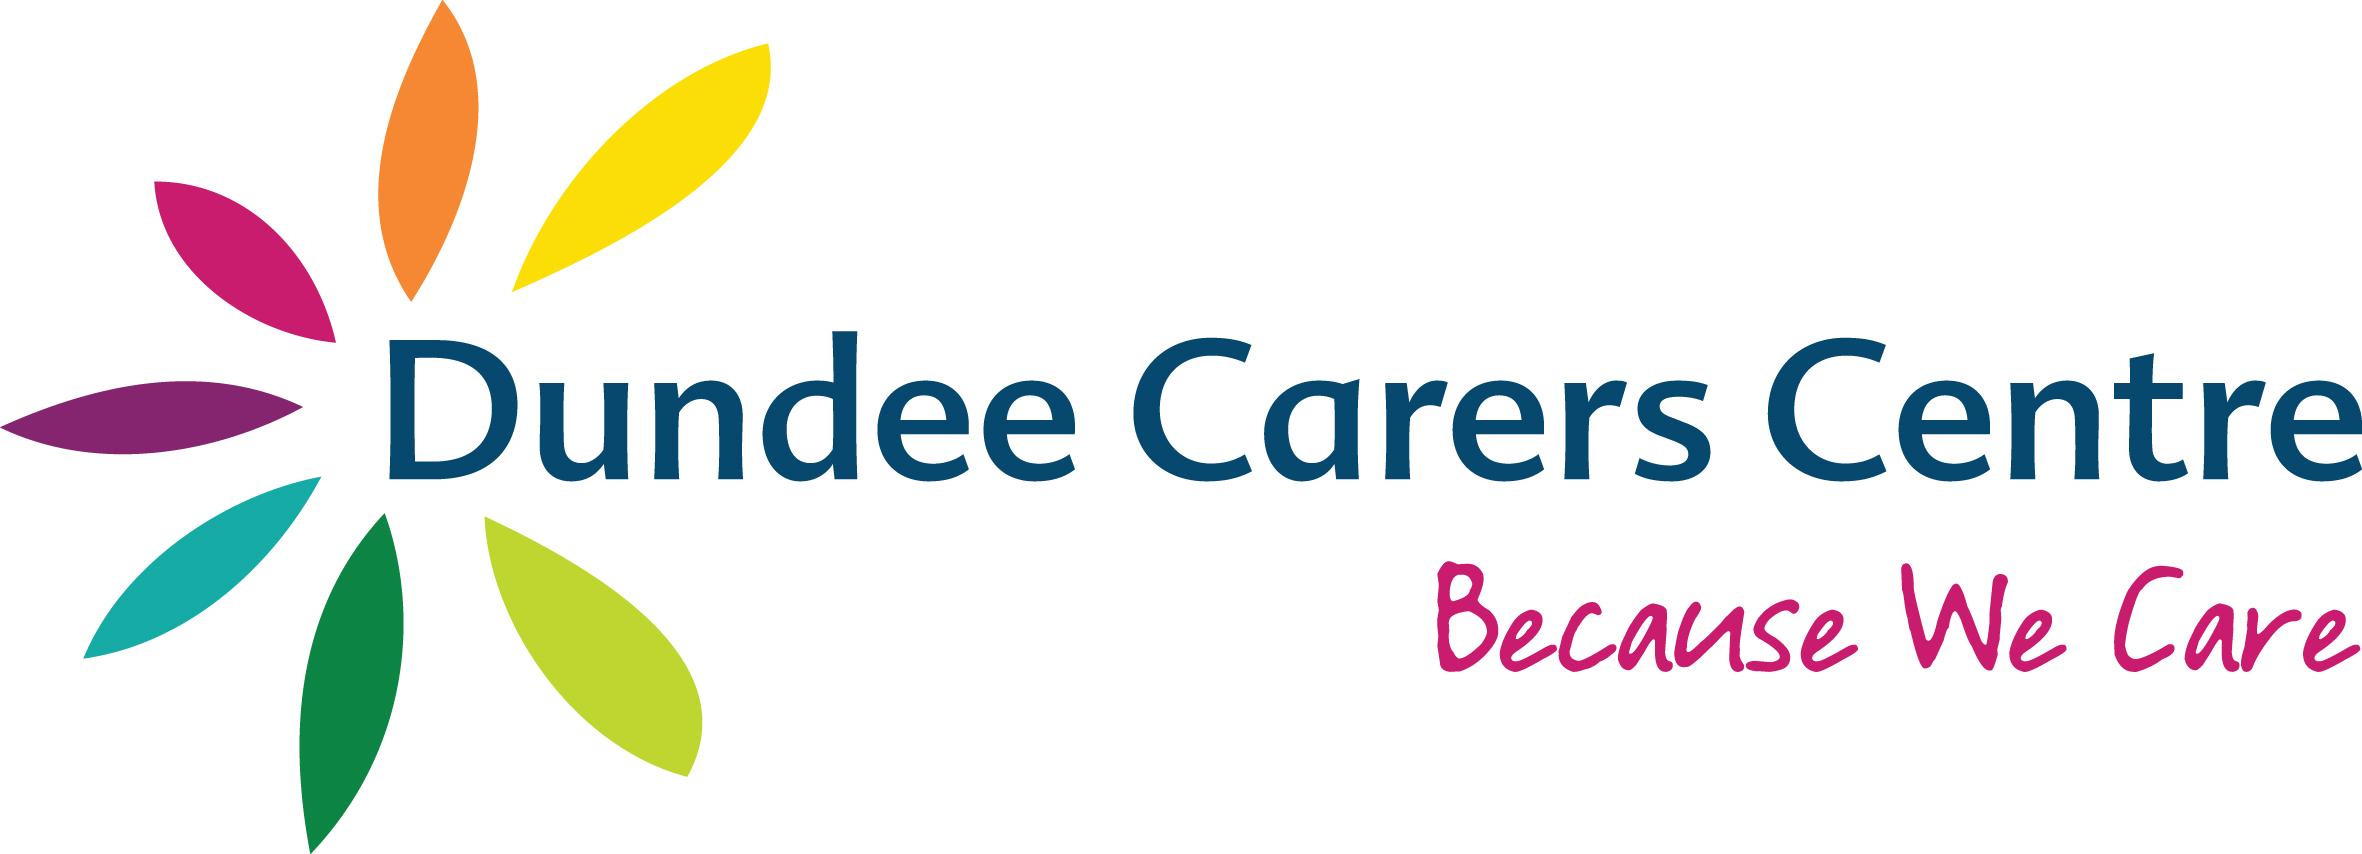 Dundee Carers Centre logo